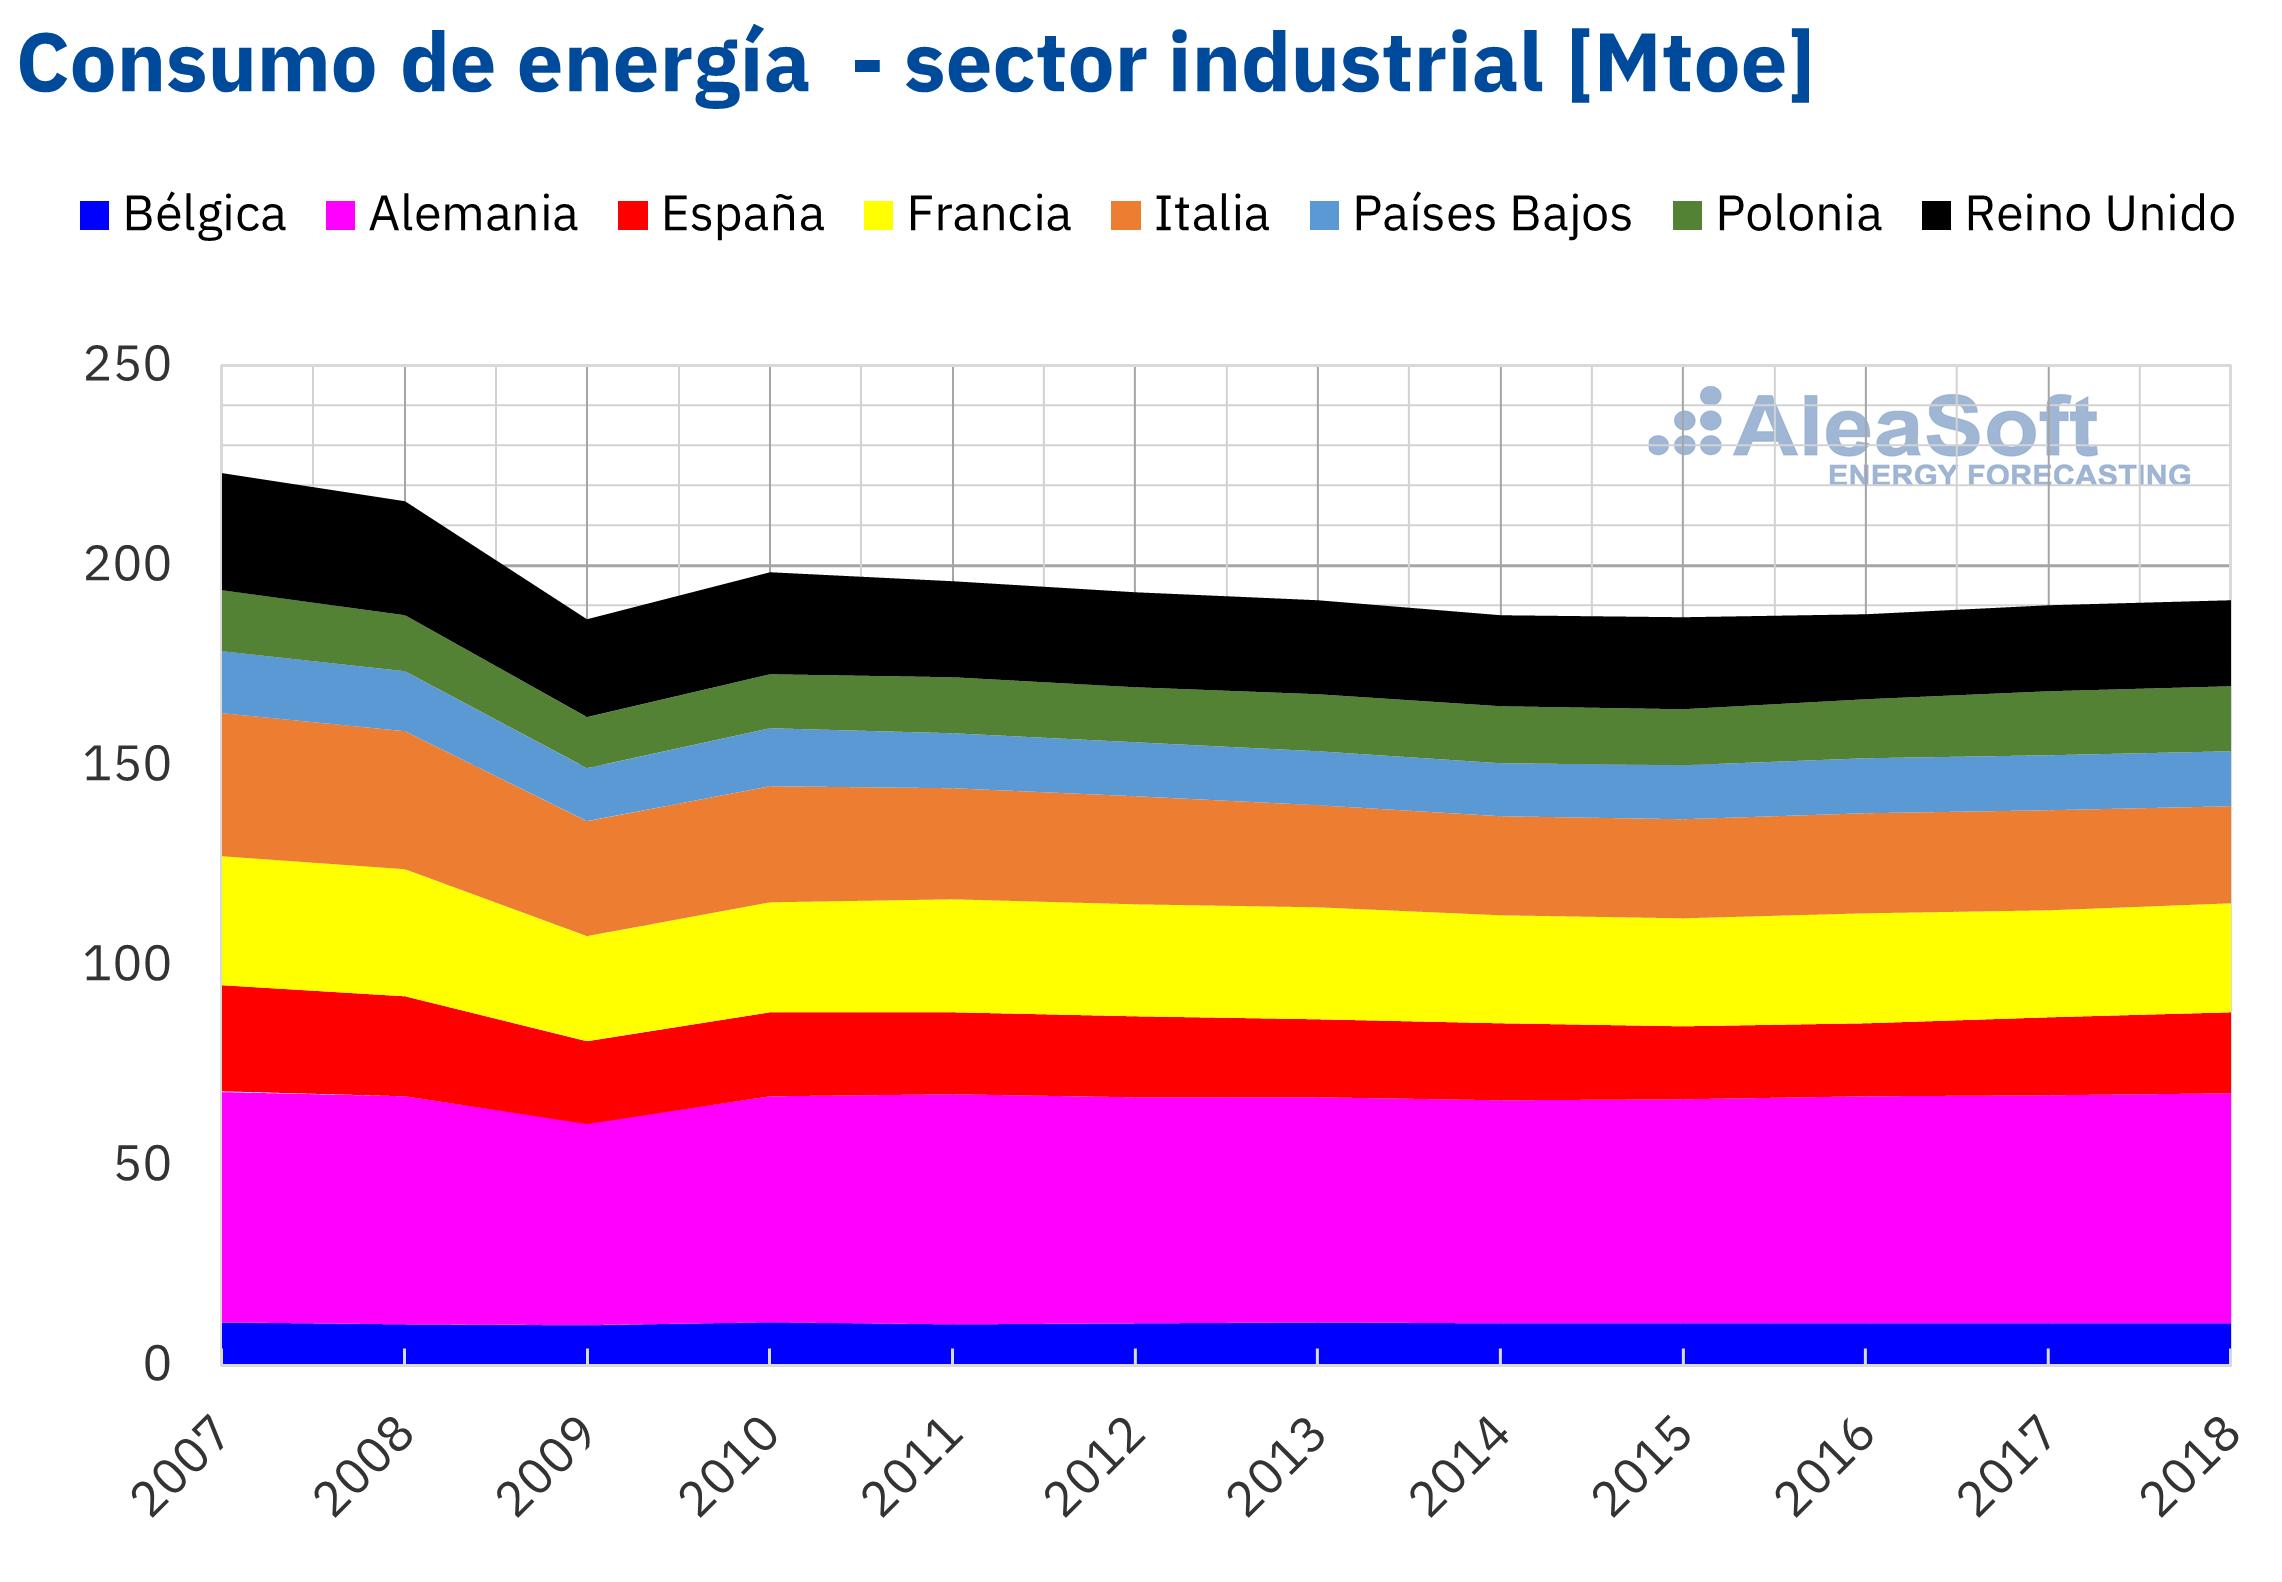 AleaSoft - Consumo energia industria Europa